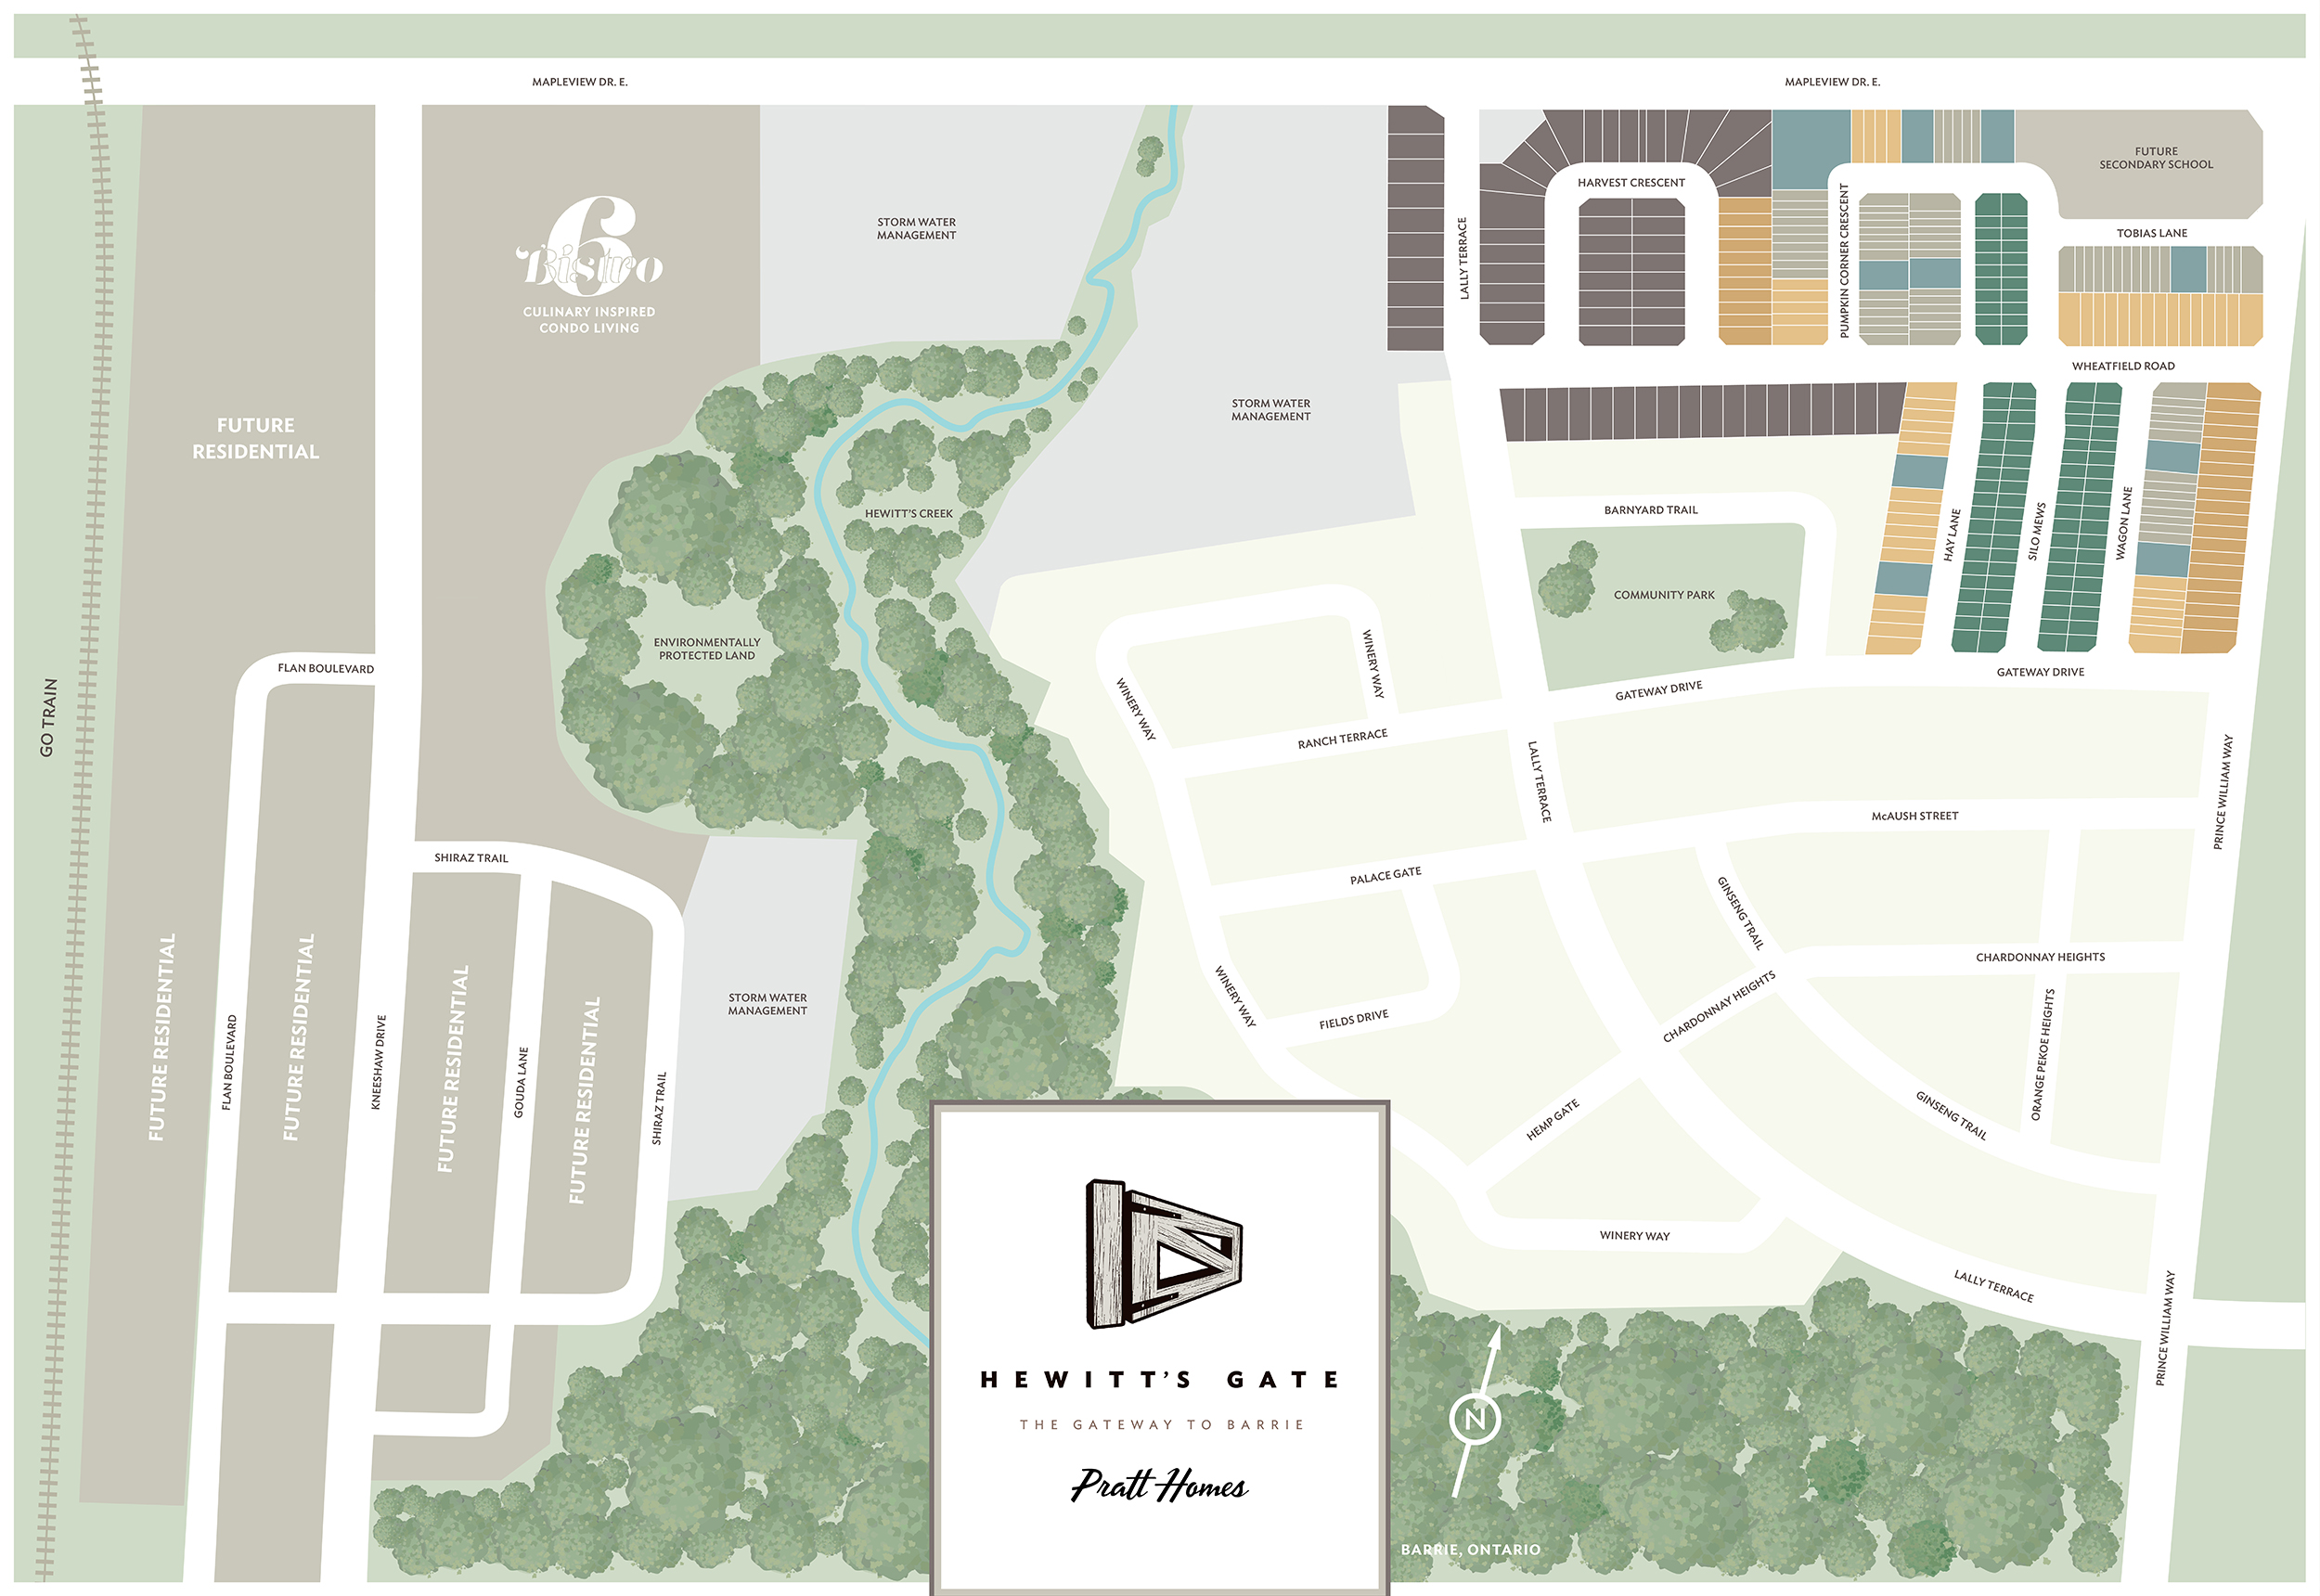 hewitt's gate map in barrie ontario from pratt homes